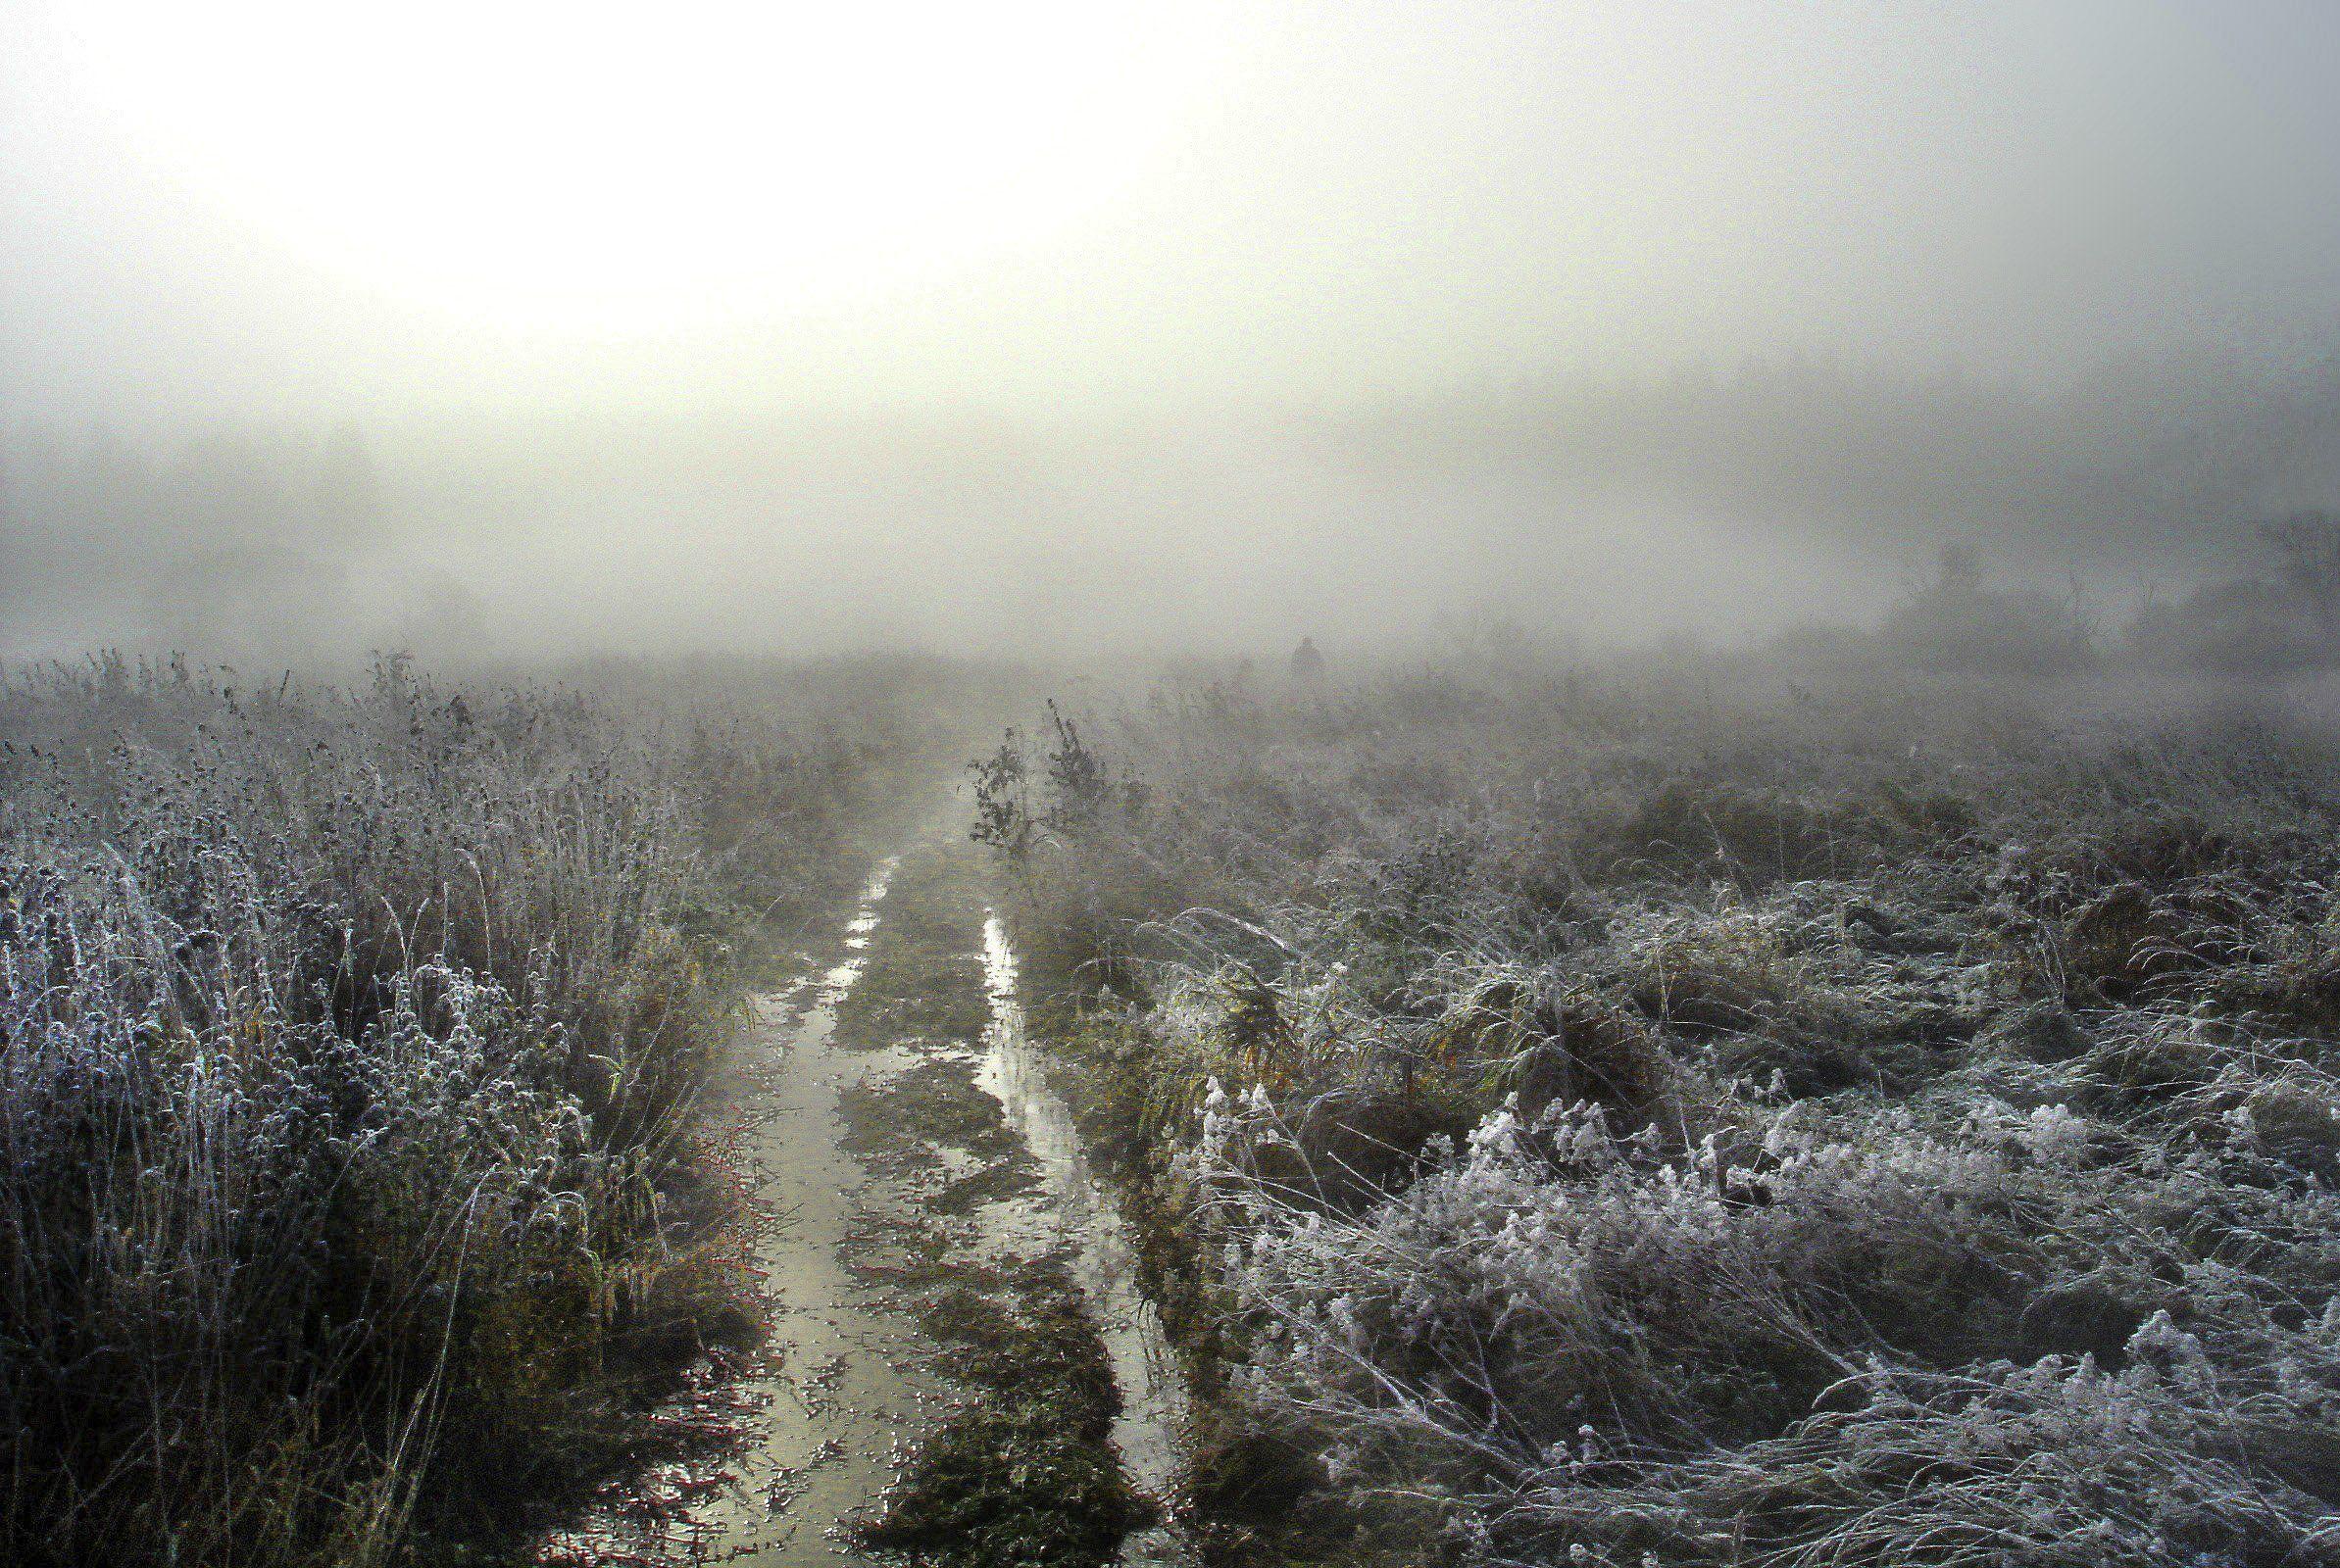 Болото, Туман, Чернаяречка, Петр Косых